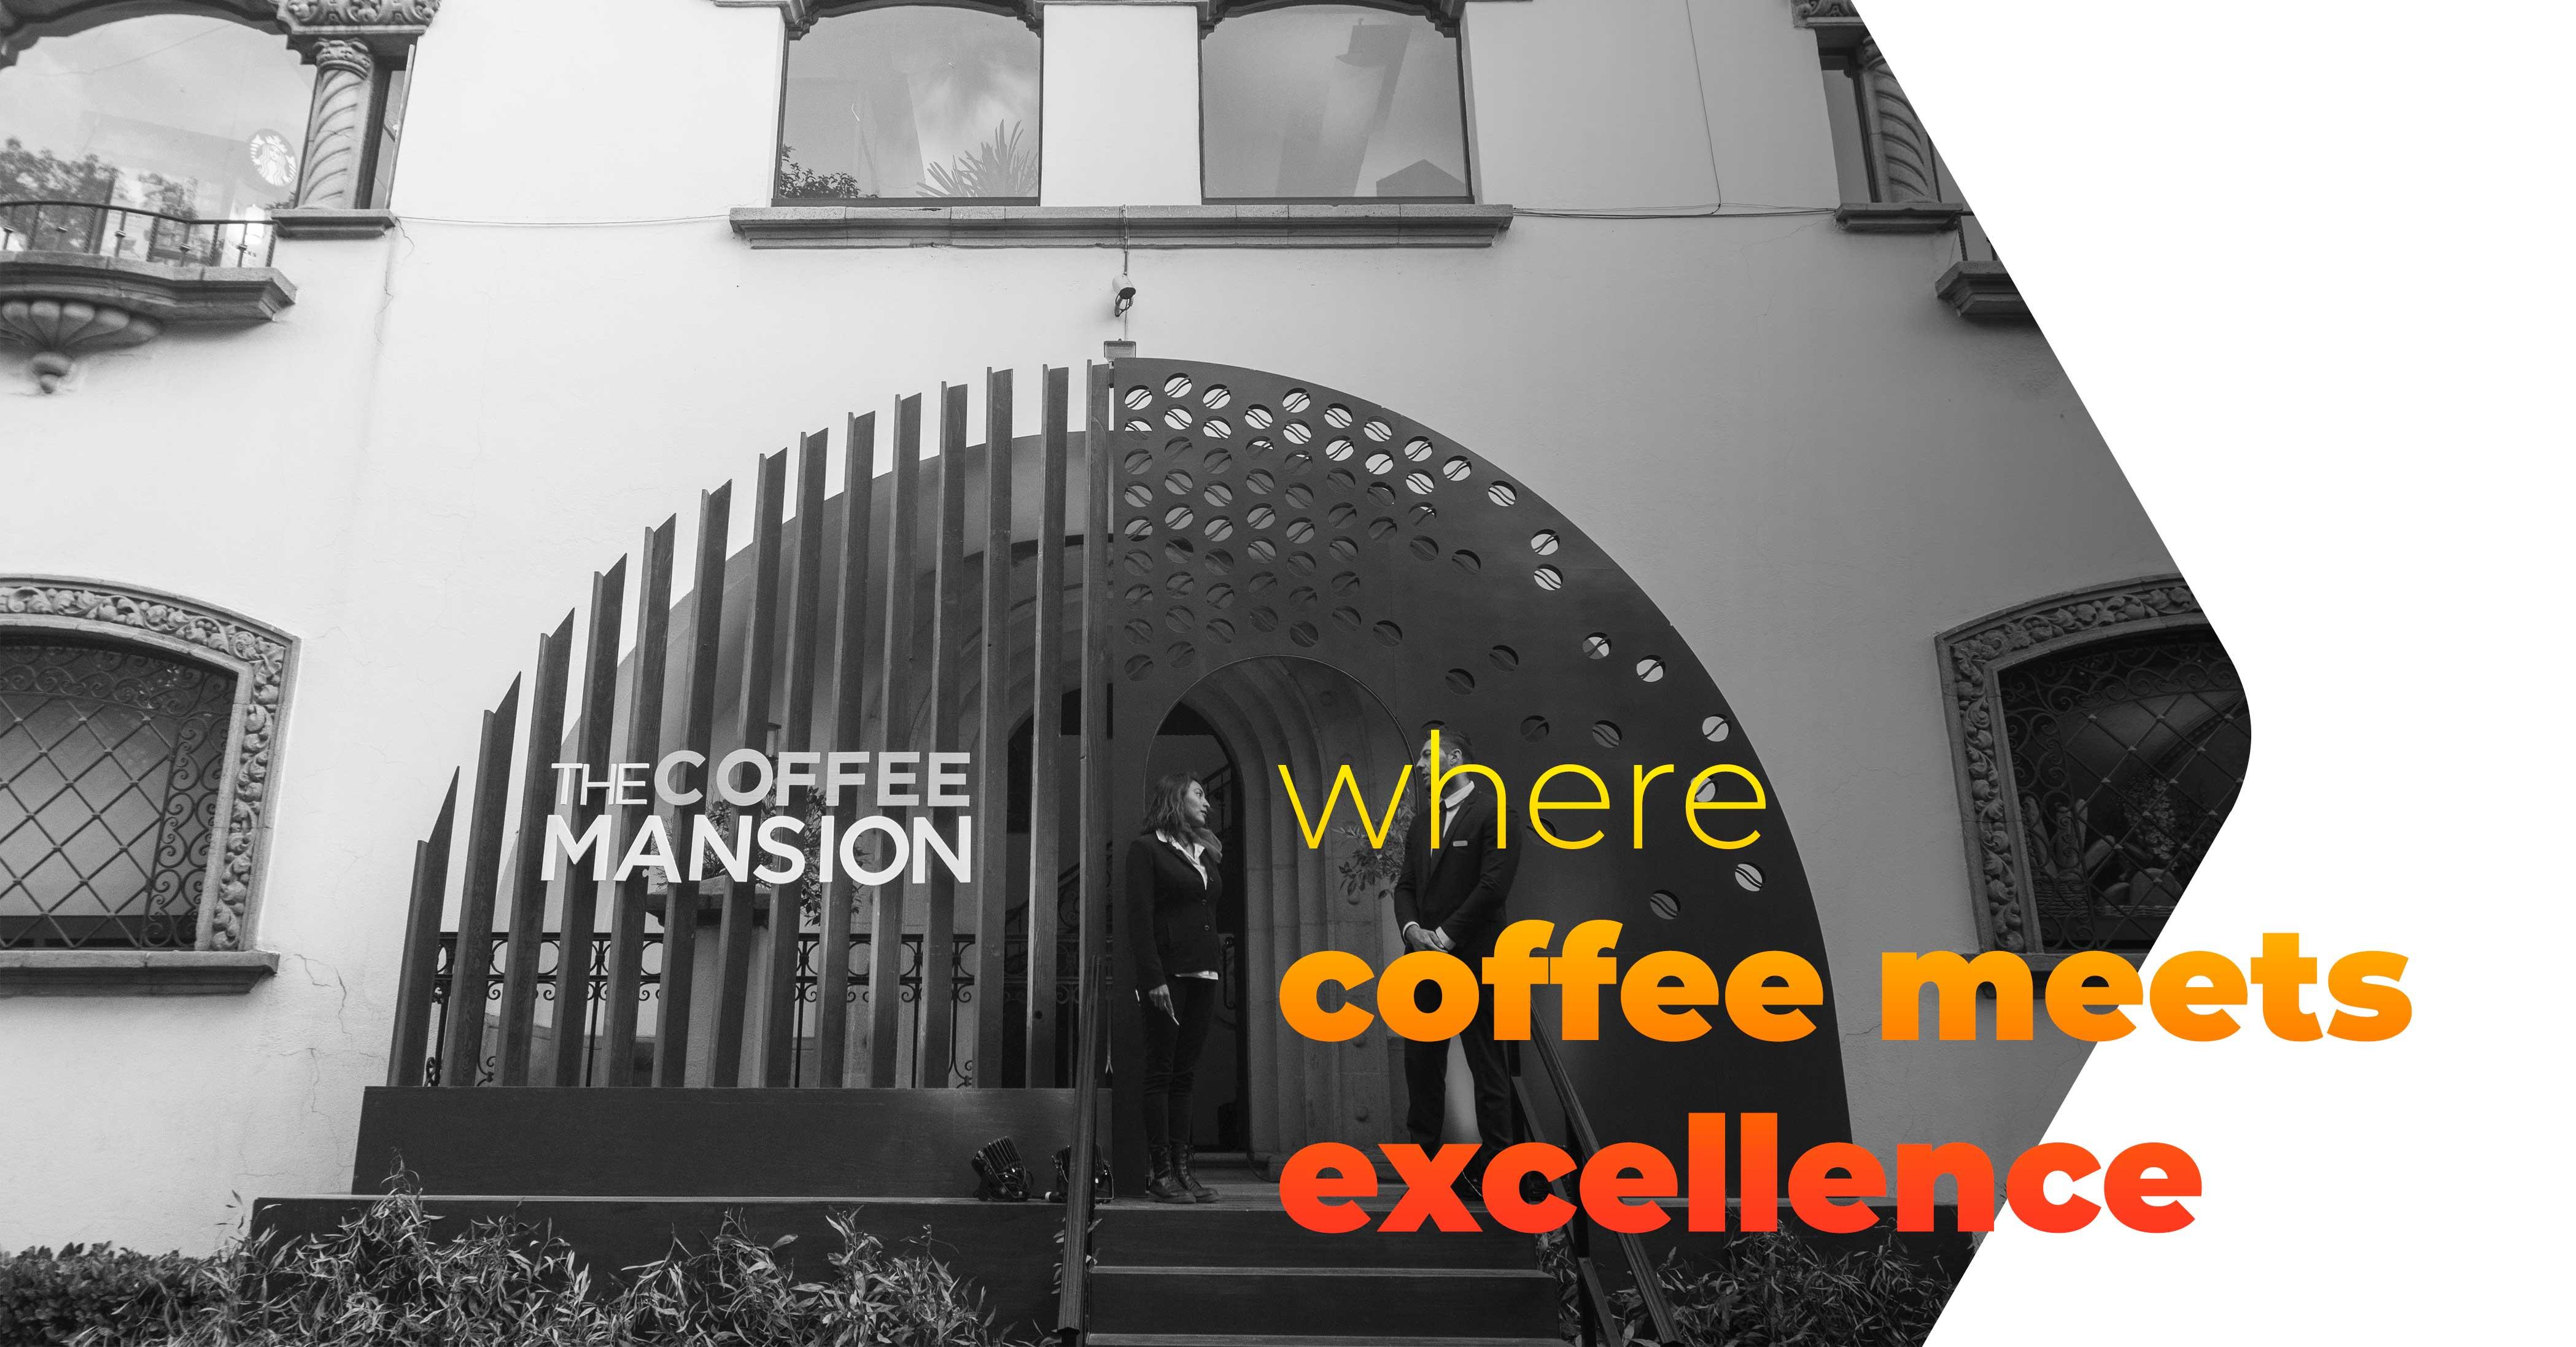 The coffee masion